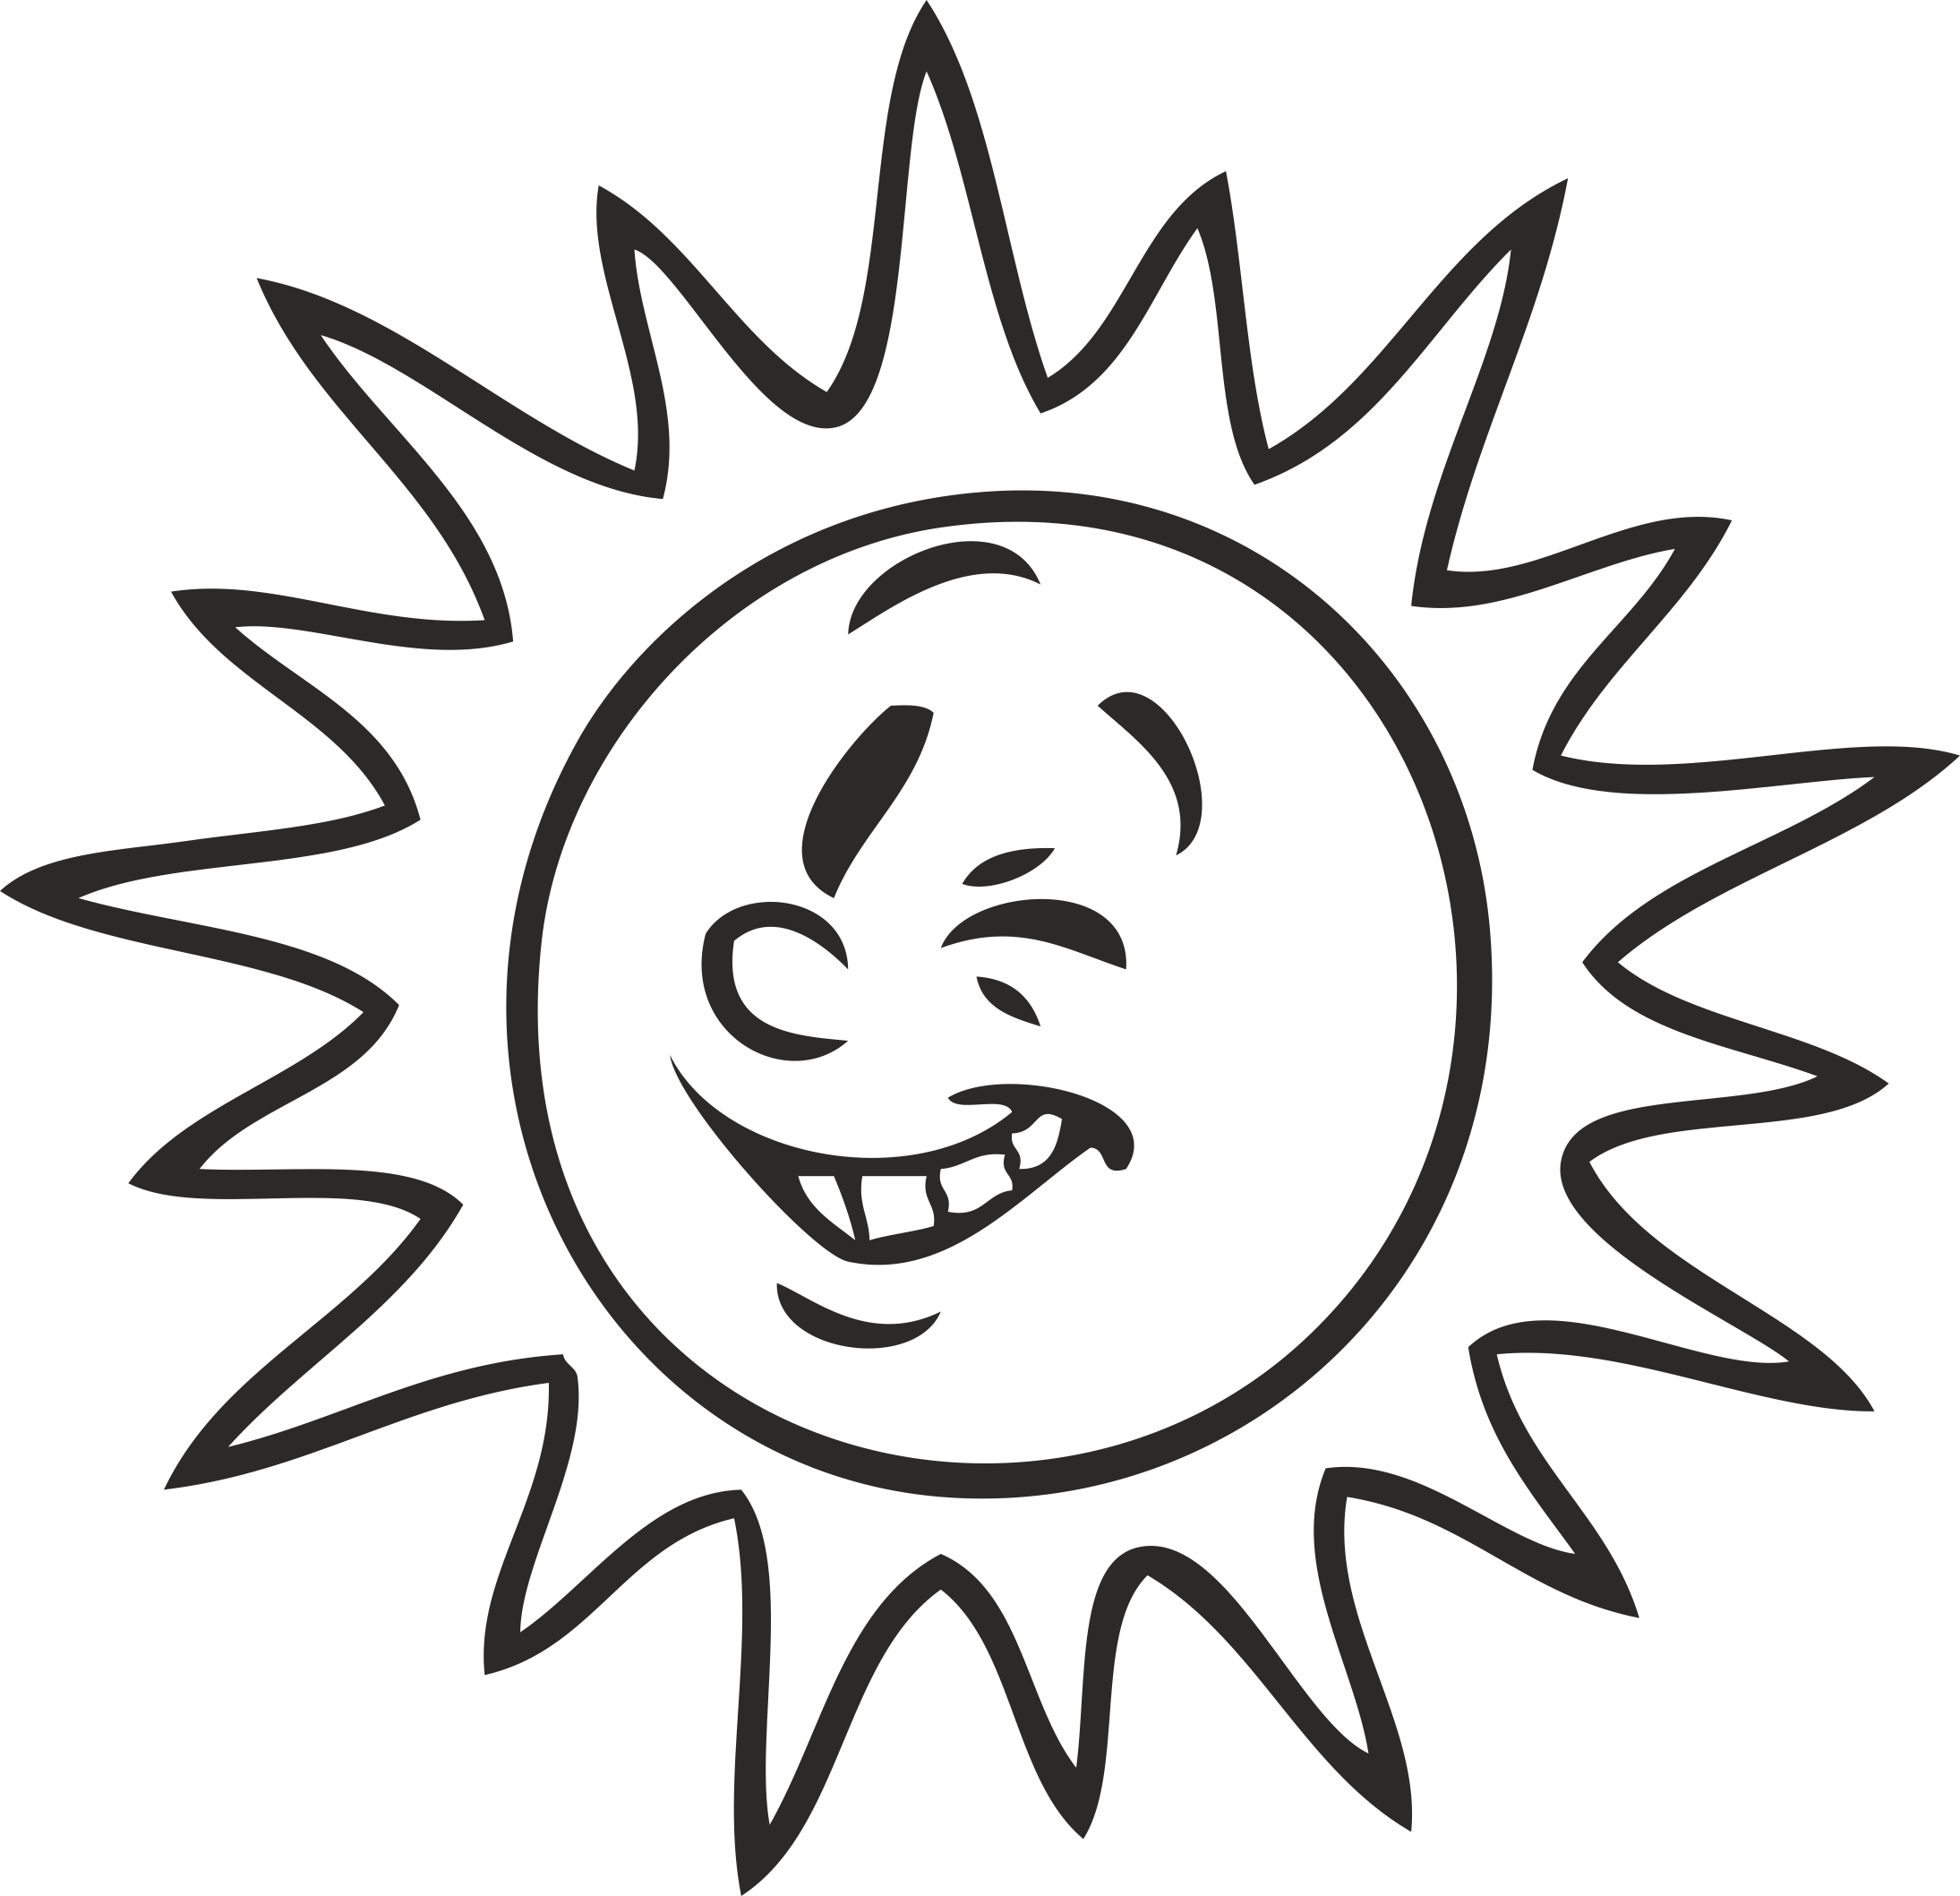 Solar Naughty Emotions # 06 Free CDR Vectors Art